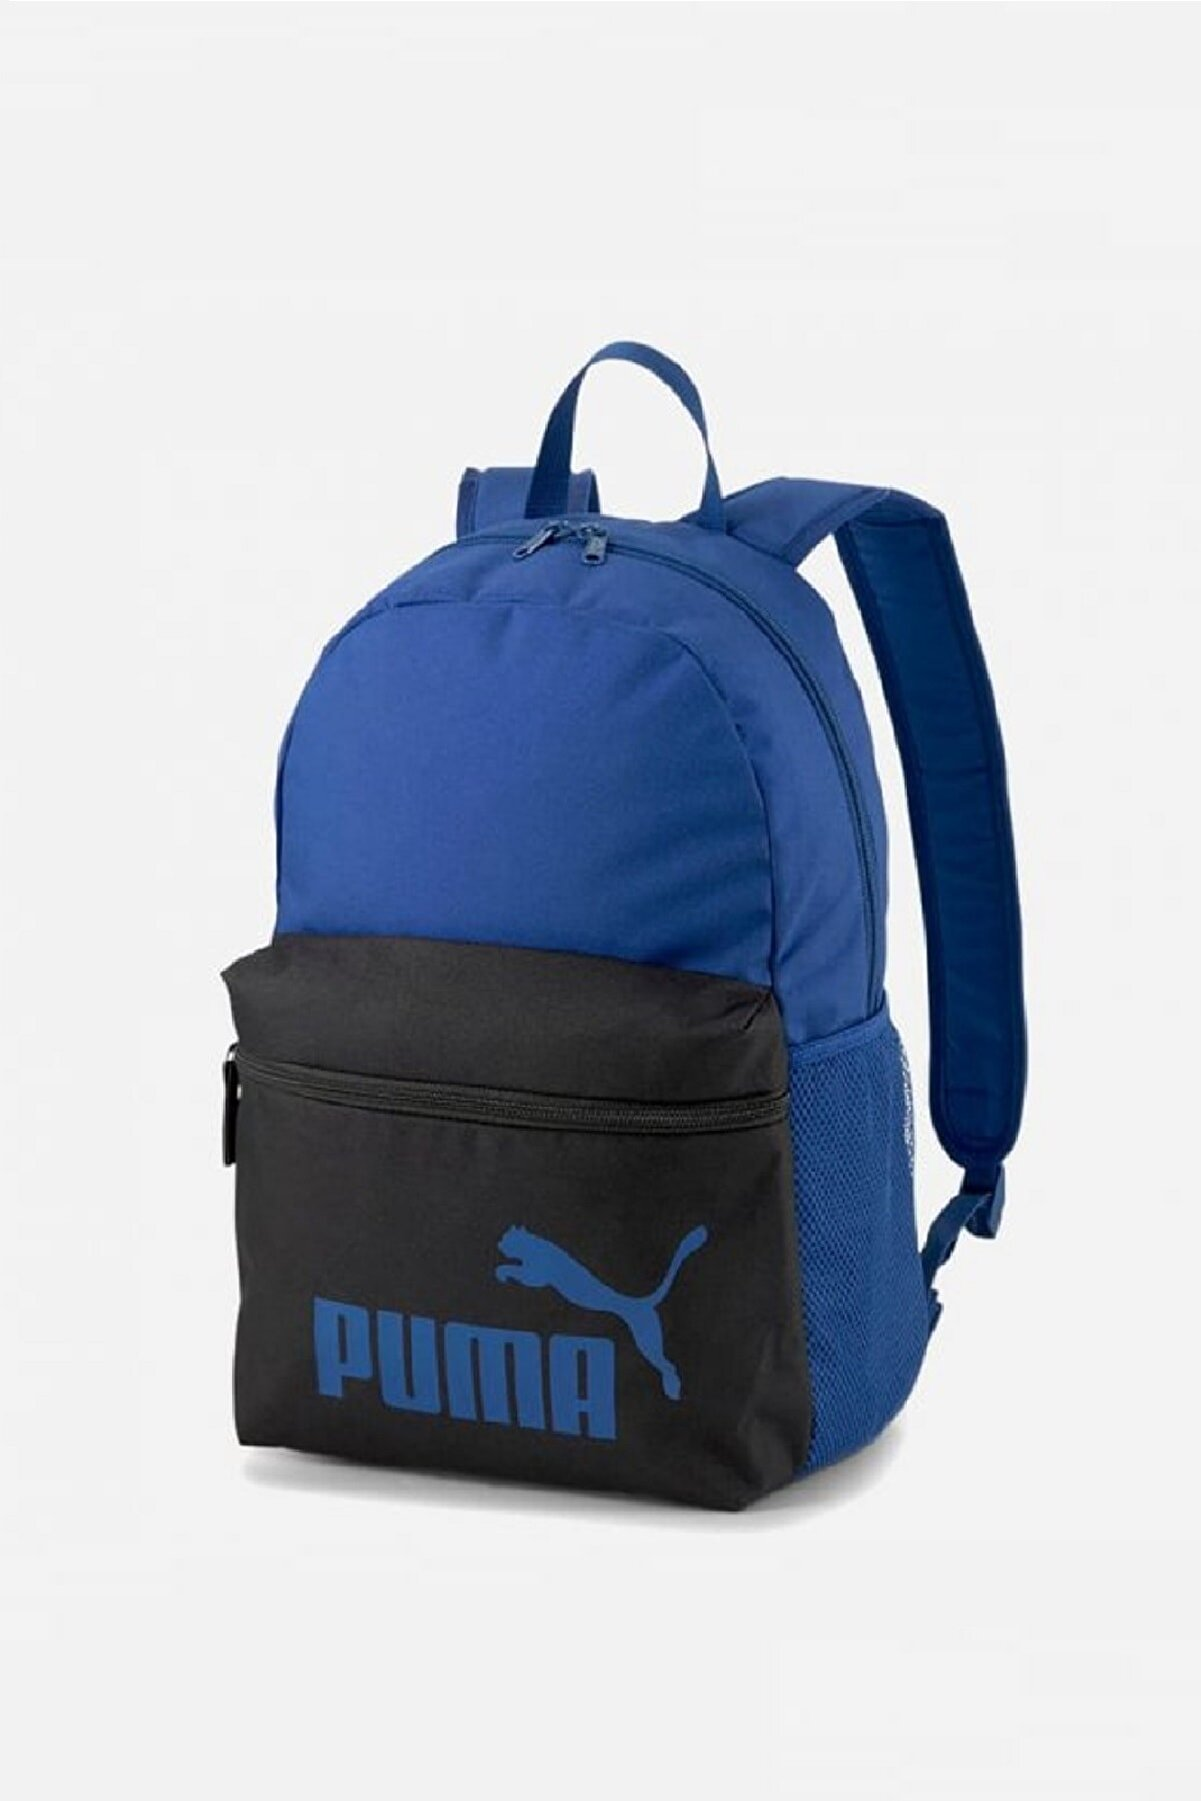 Puma Phase Backpack Sırt Çantası 7548769 Mavi